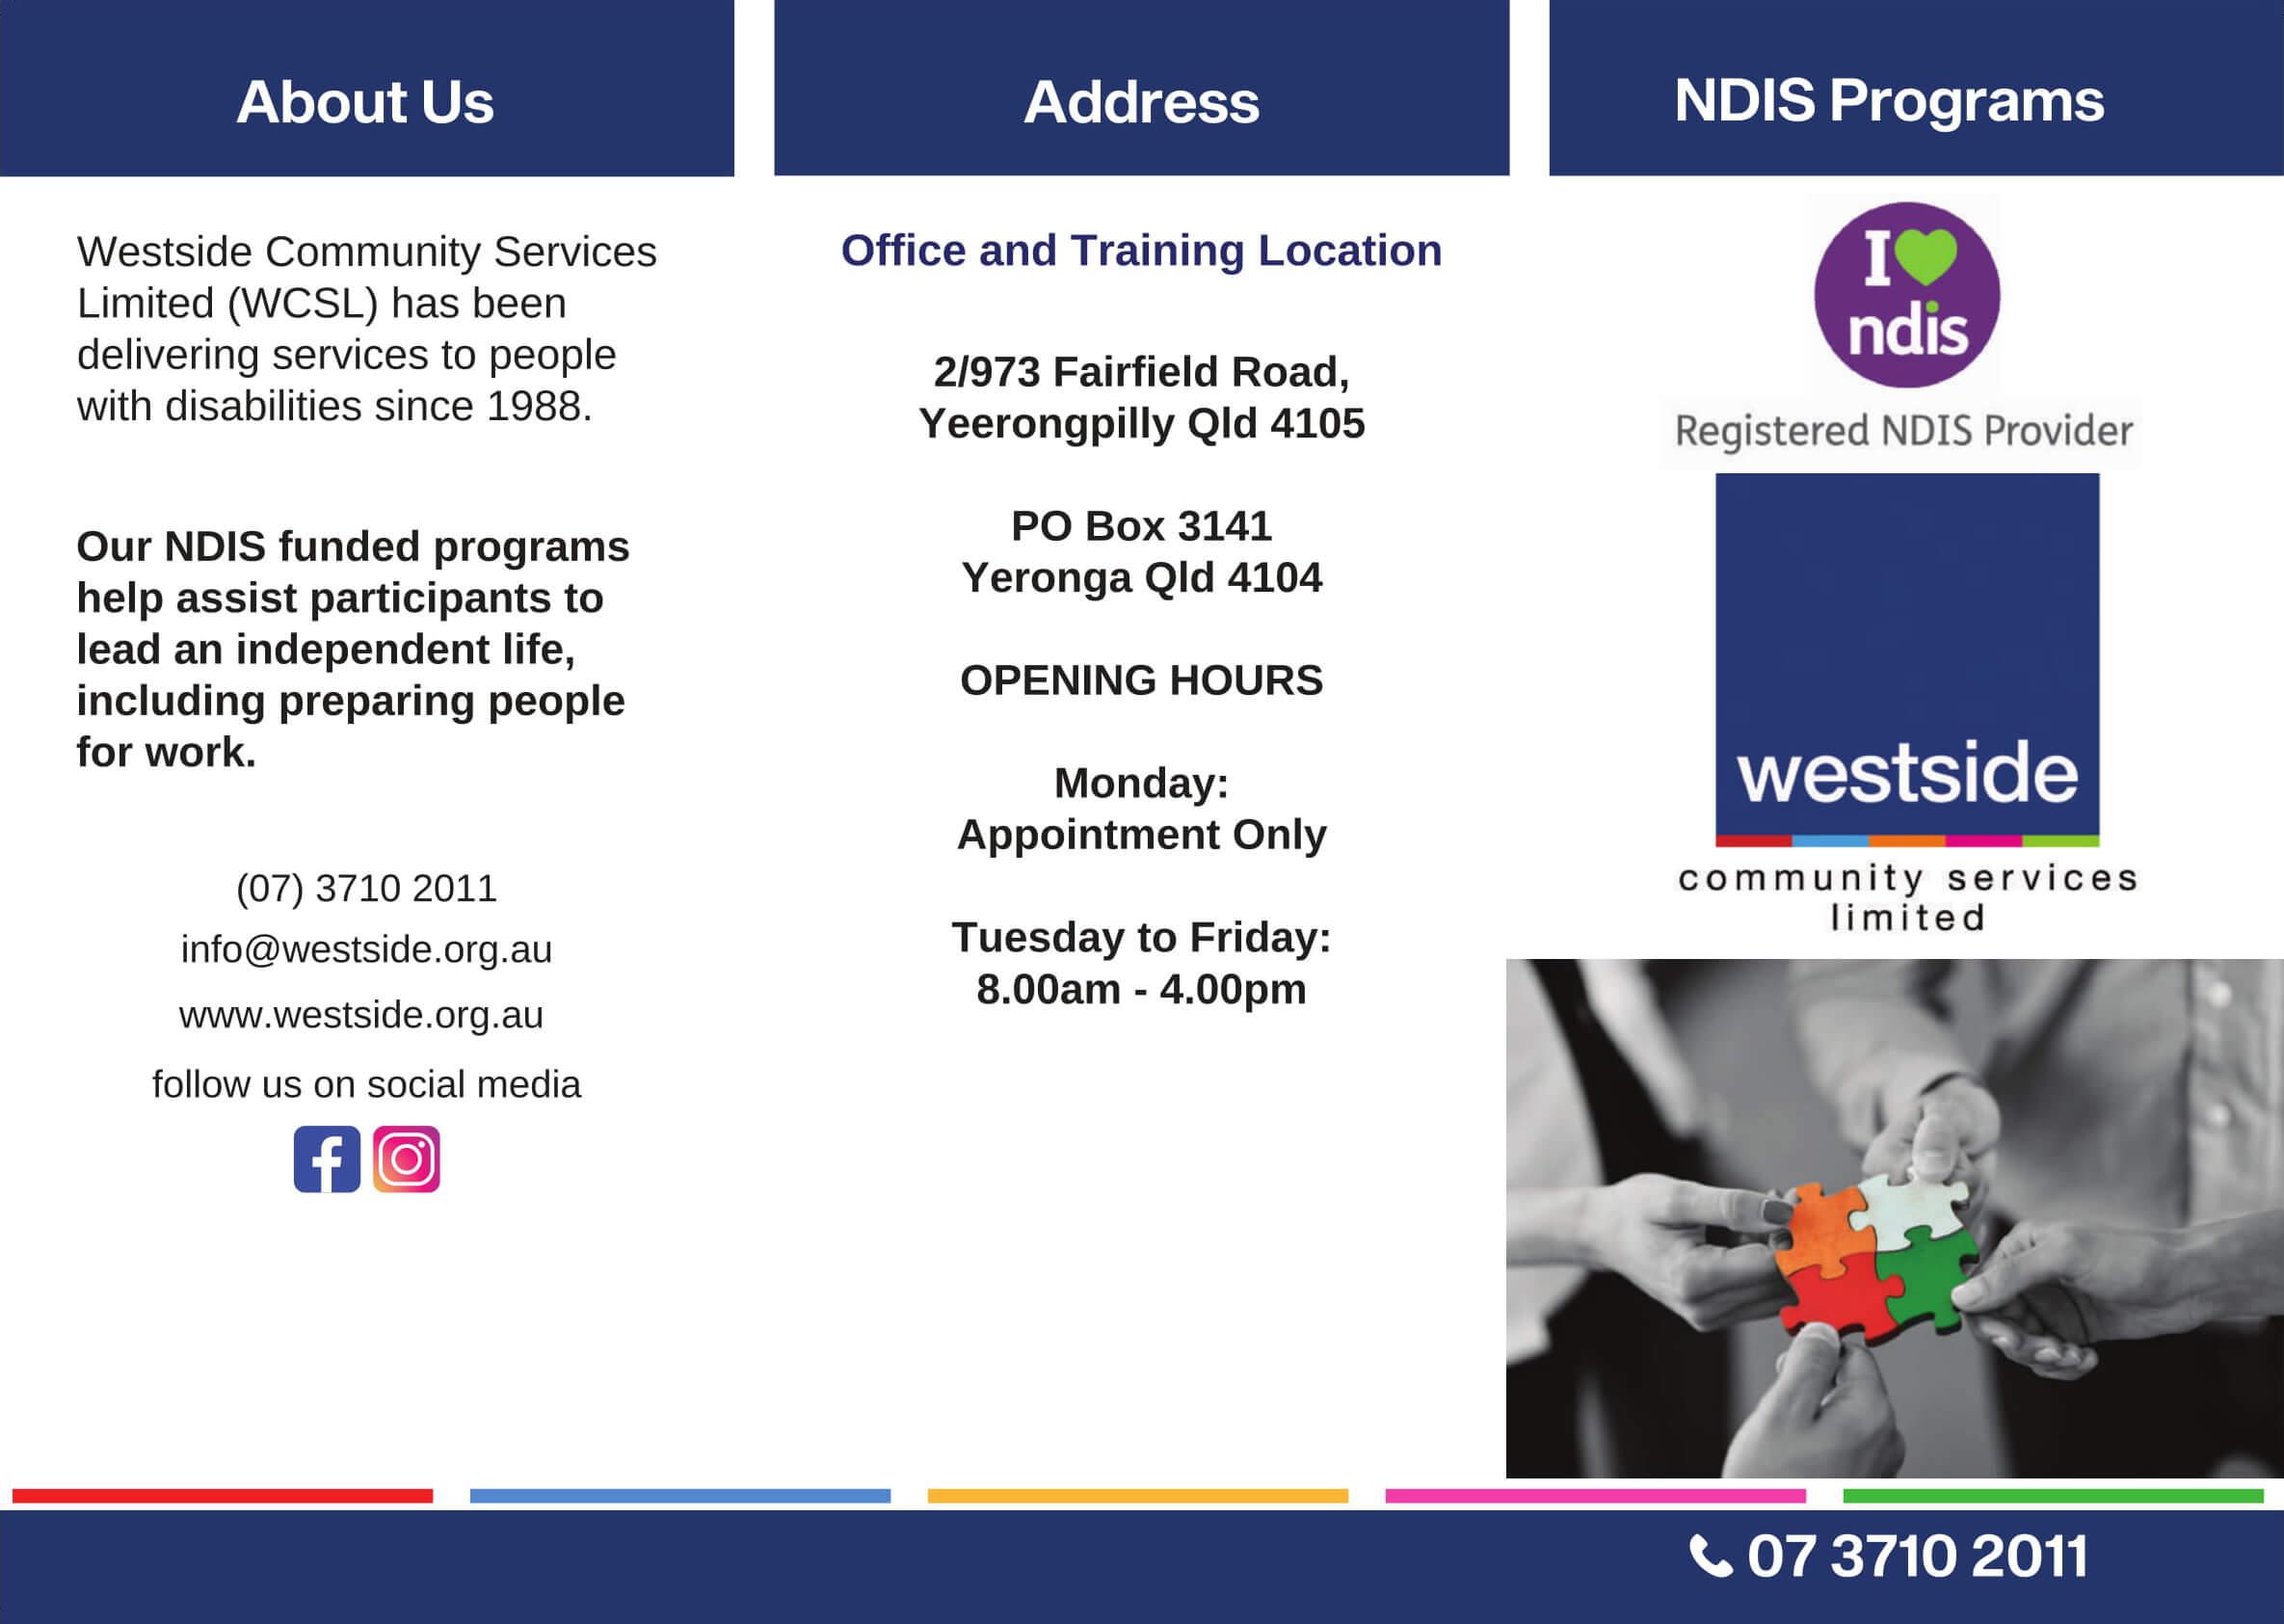 Westside Brochure Resources